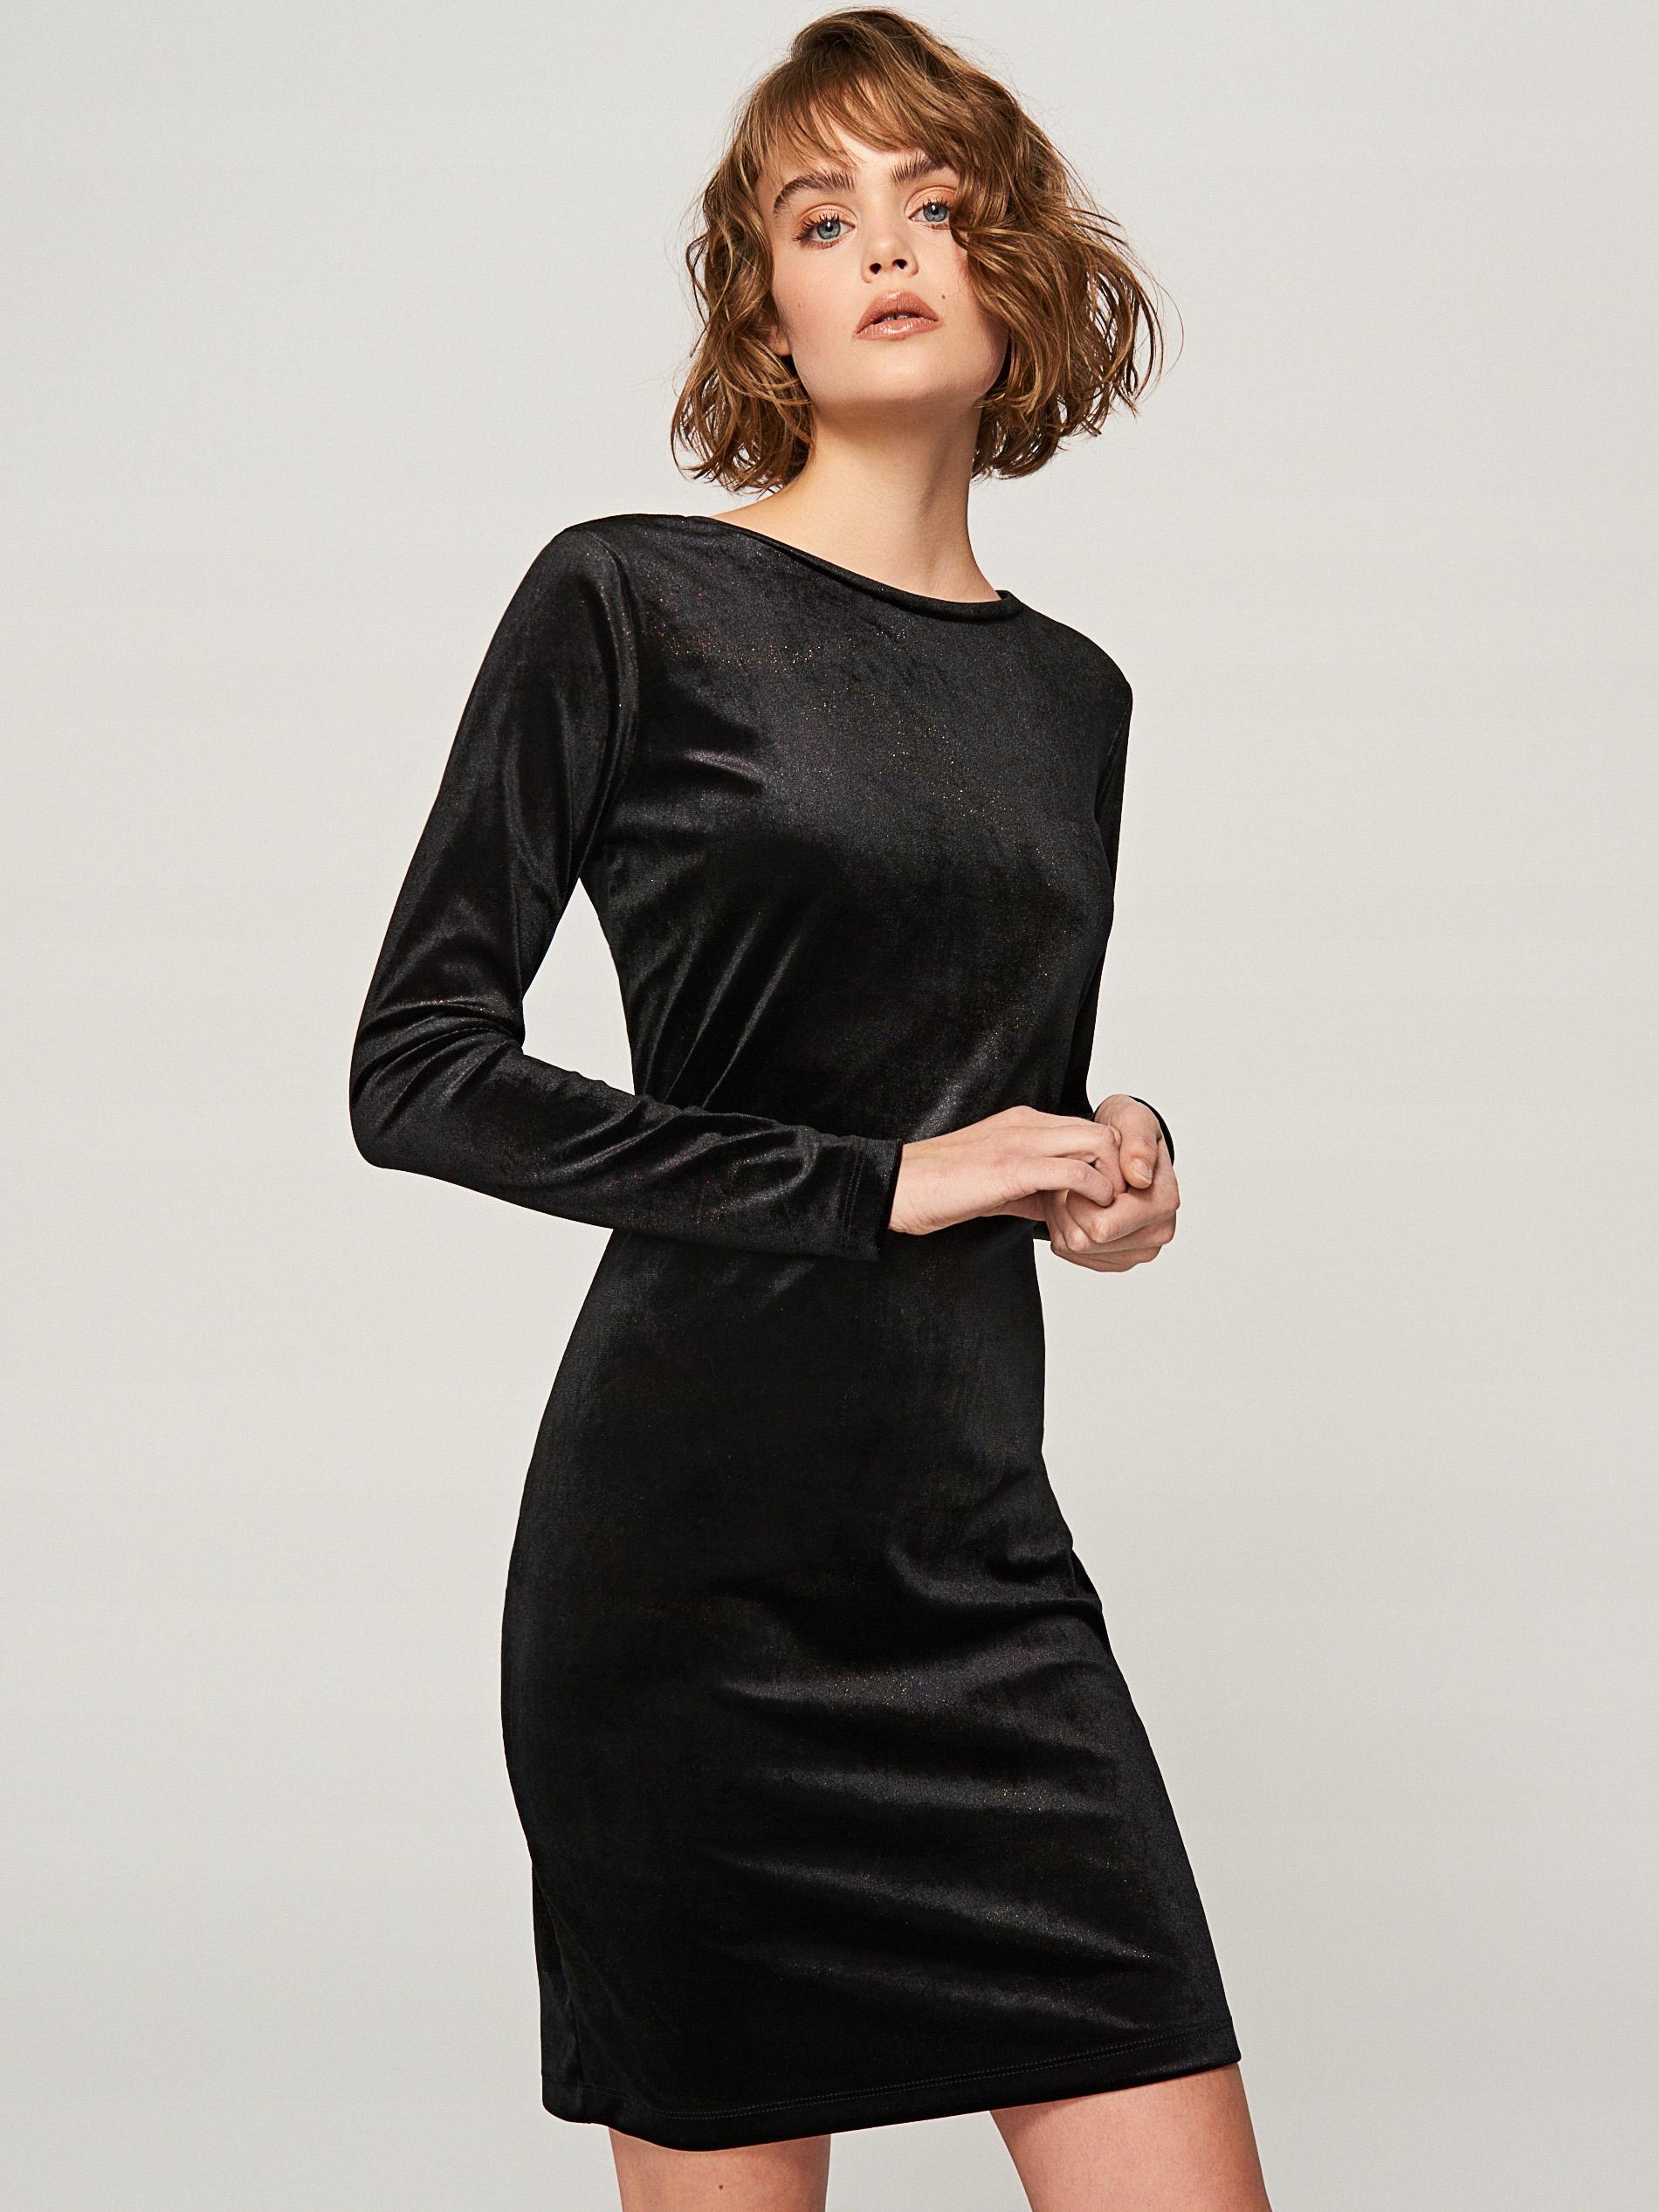 2cac094f RESERVED sukienka czarna welur 40 L NOWA Święta